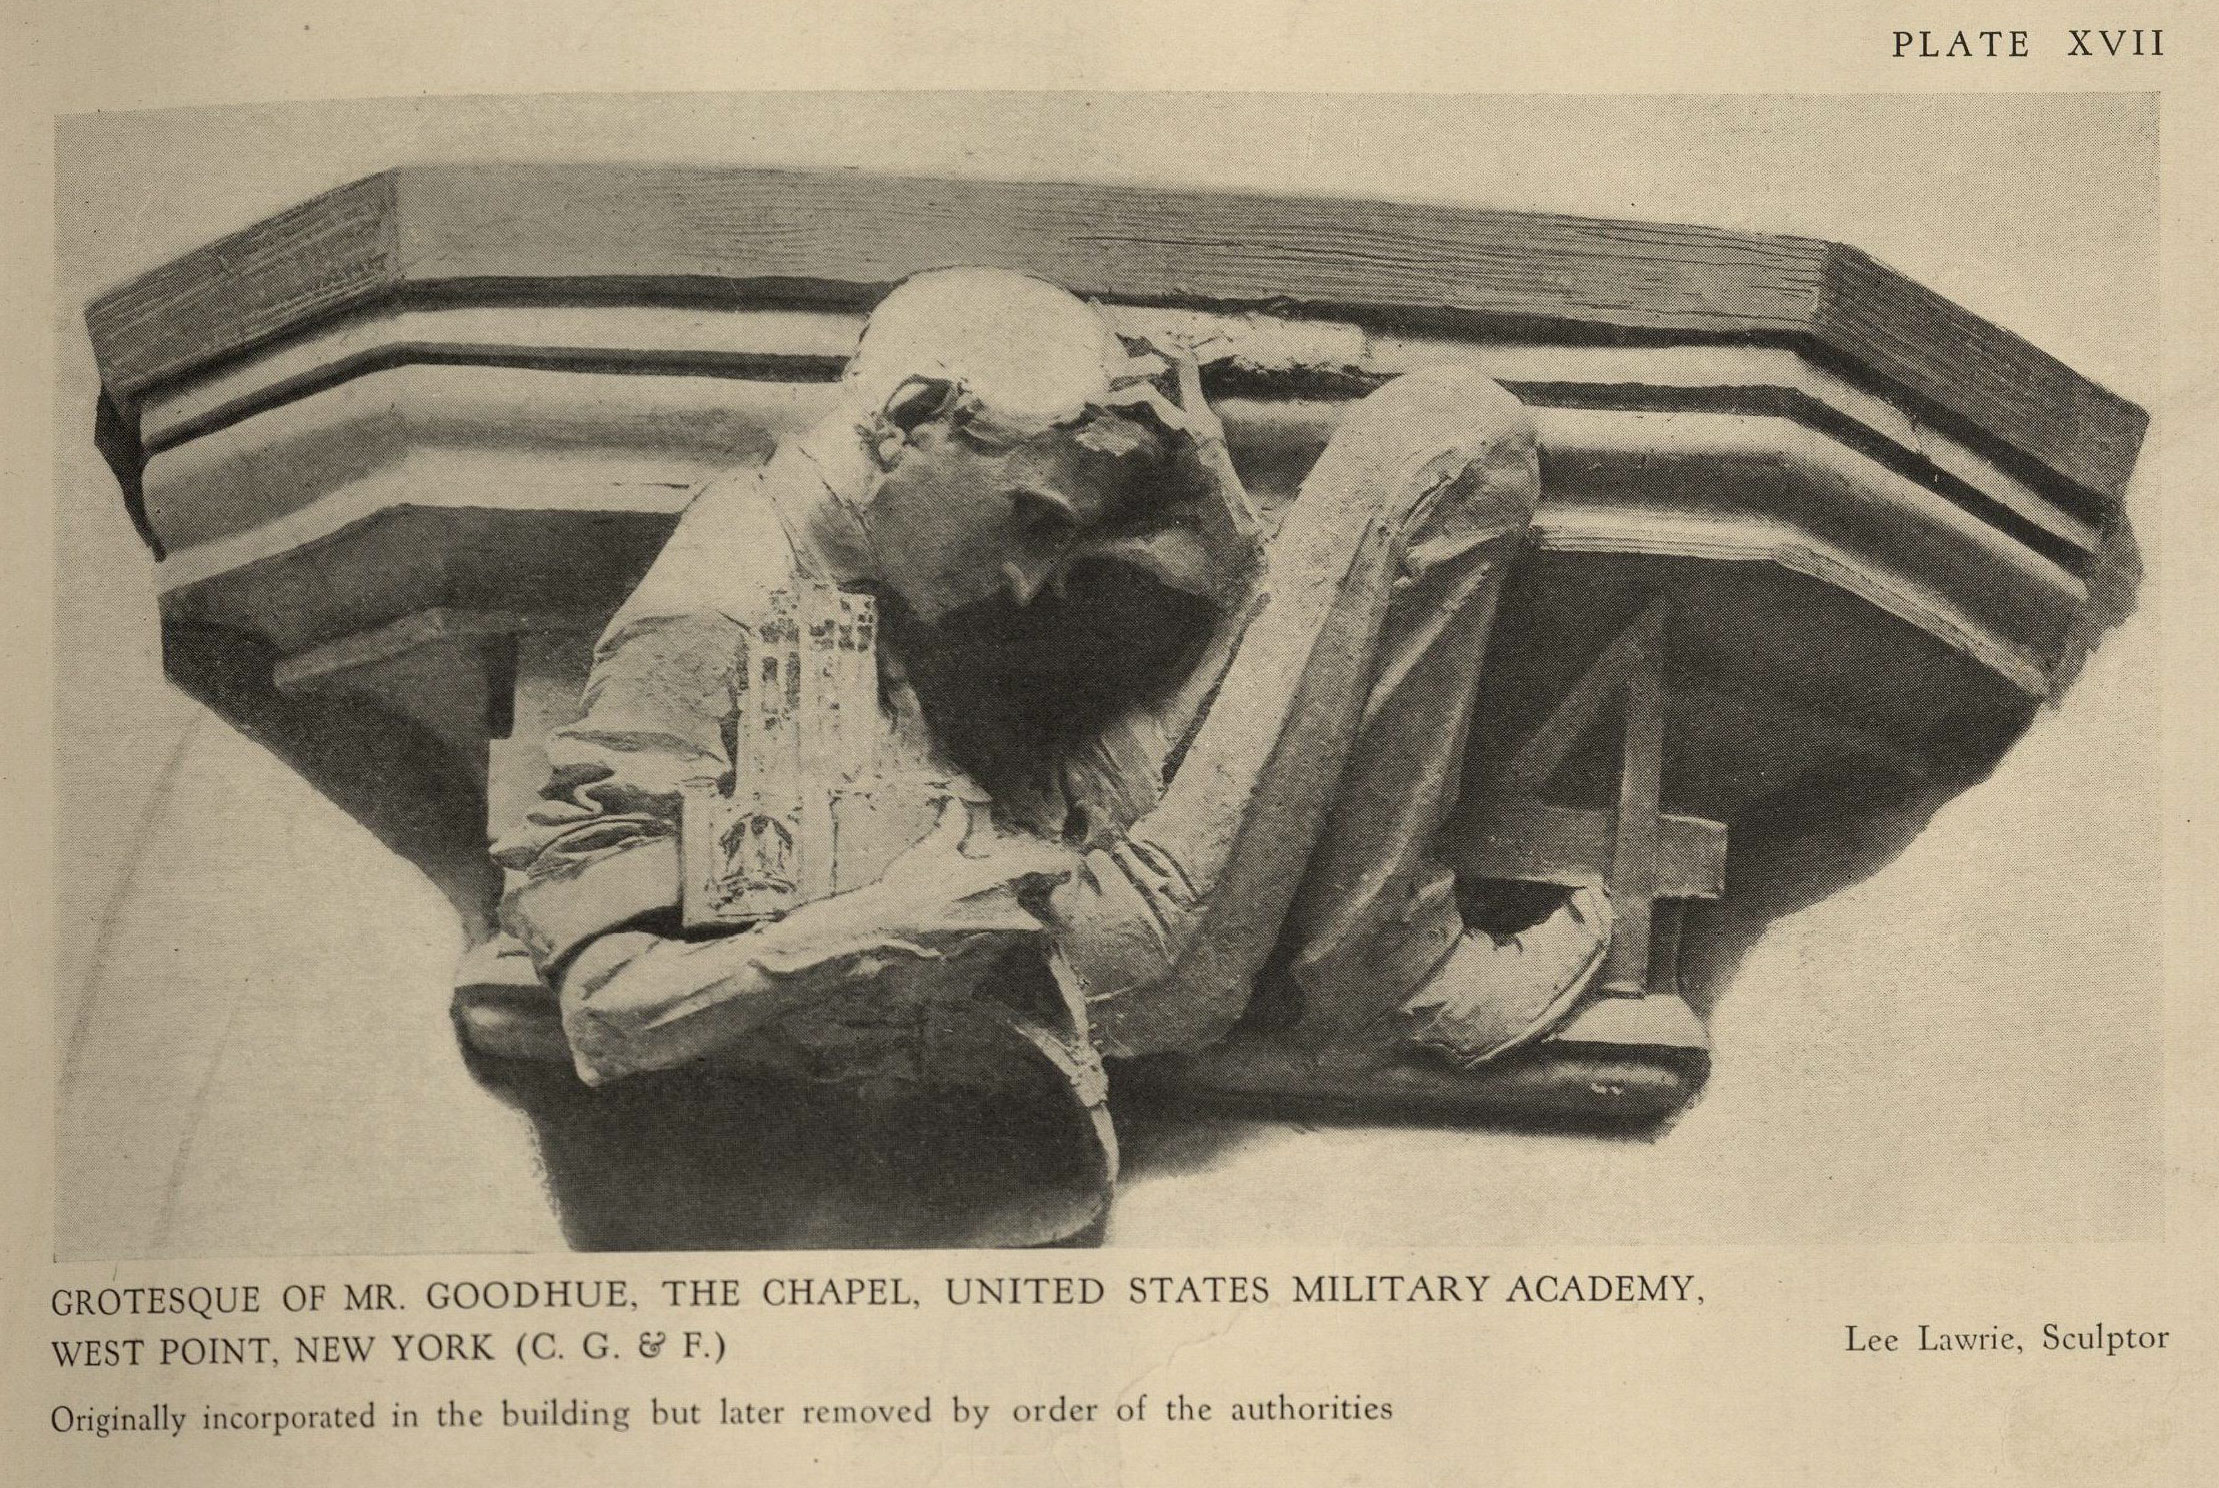 Goodhue: Architect and Master of Many Arts. Plate XVII